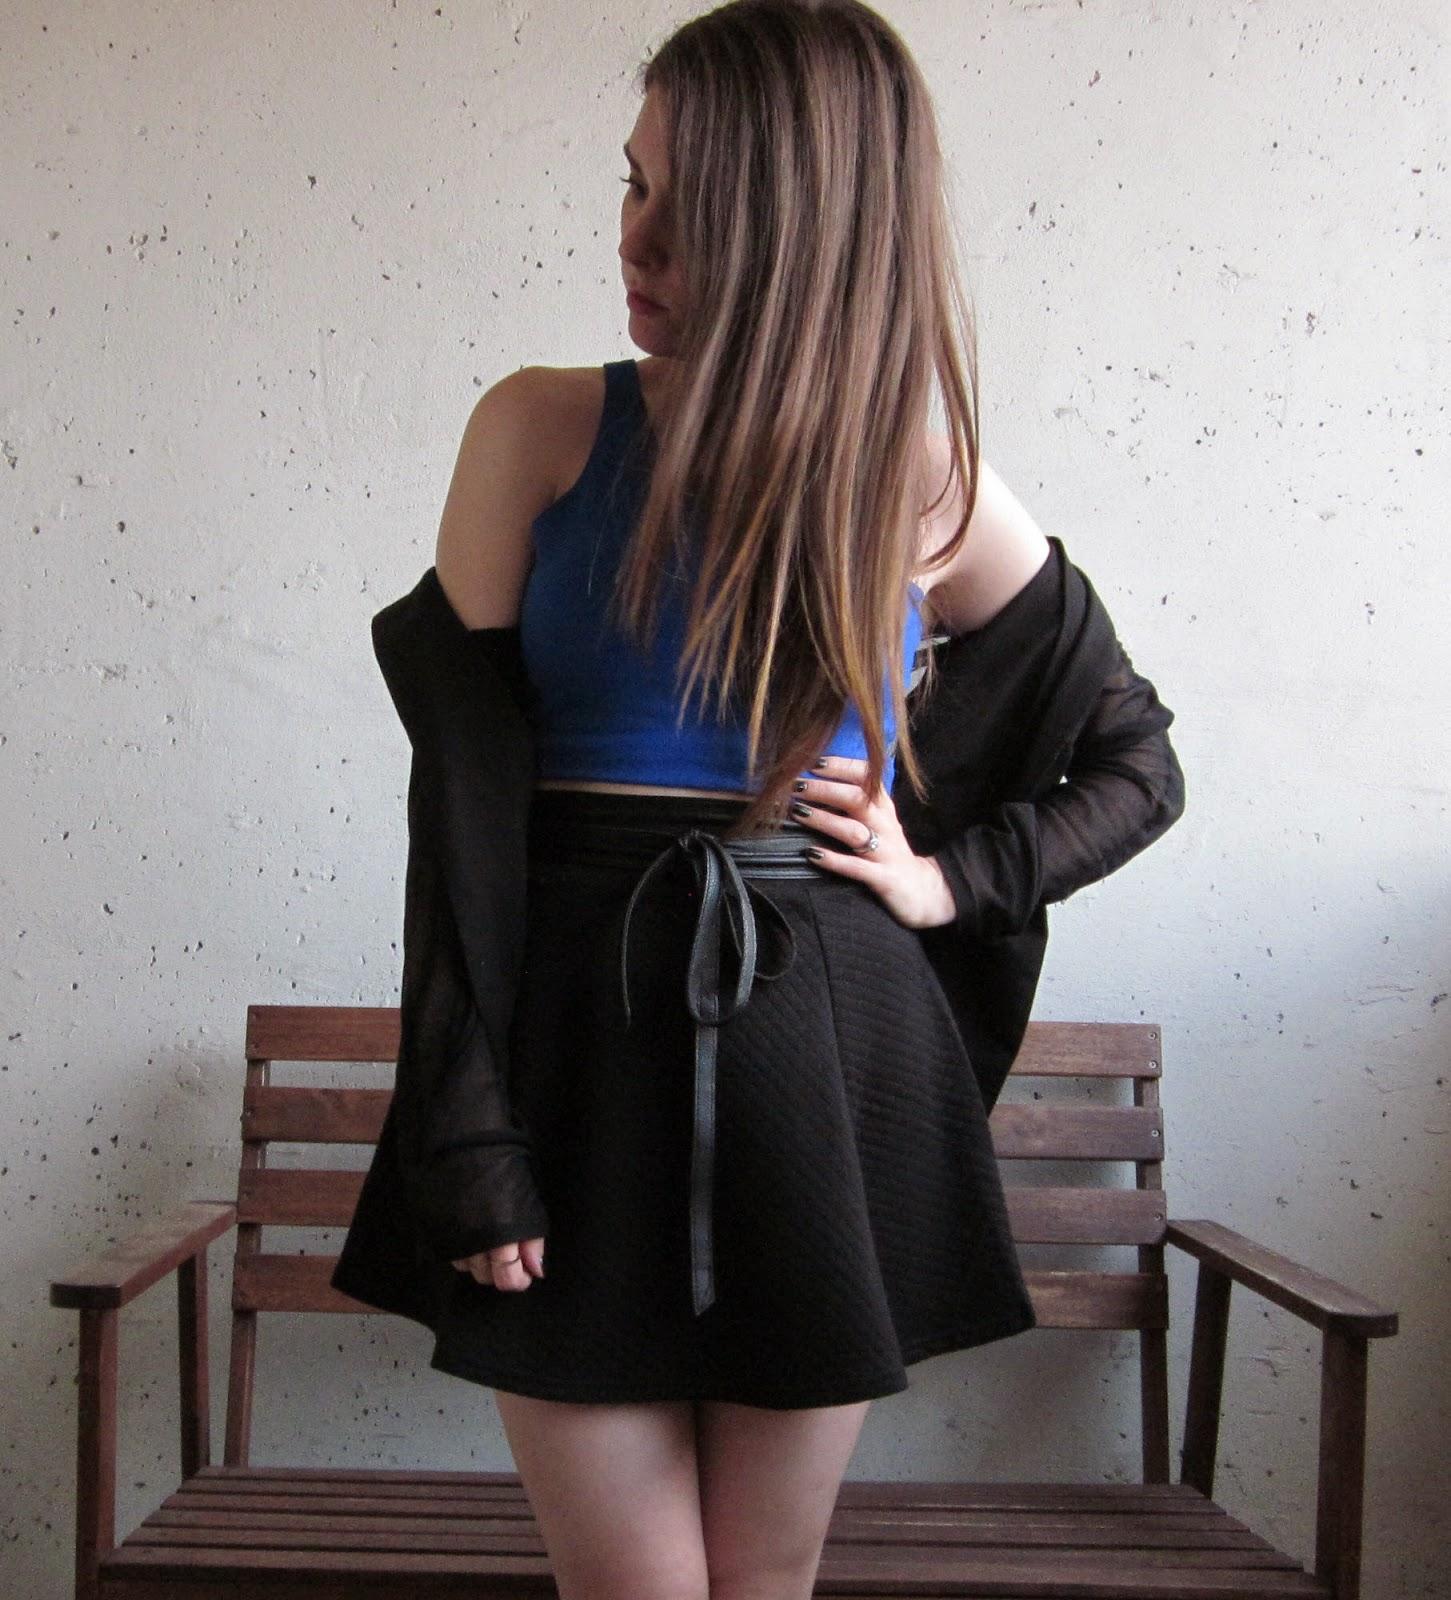 Royal Blue Crop Top and Black Mini Skirt